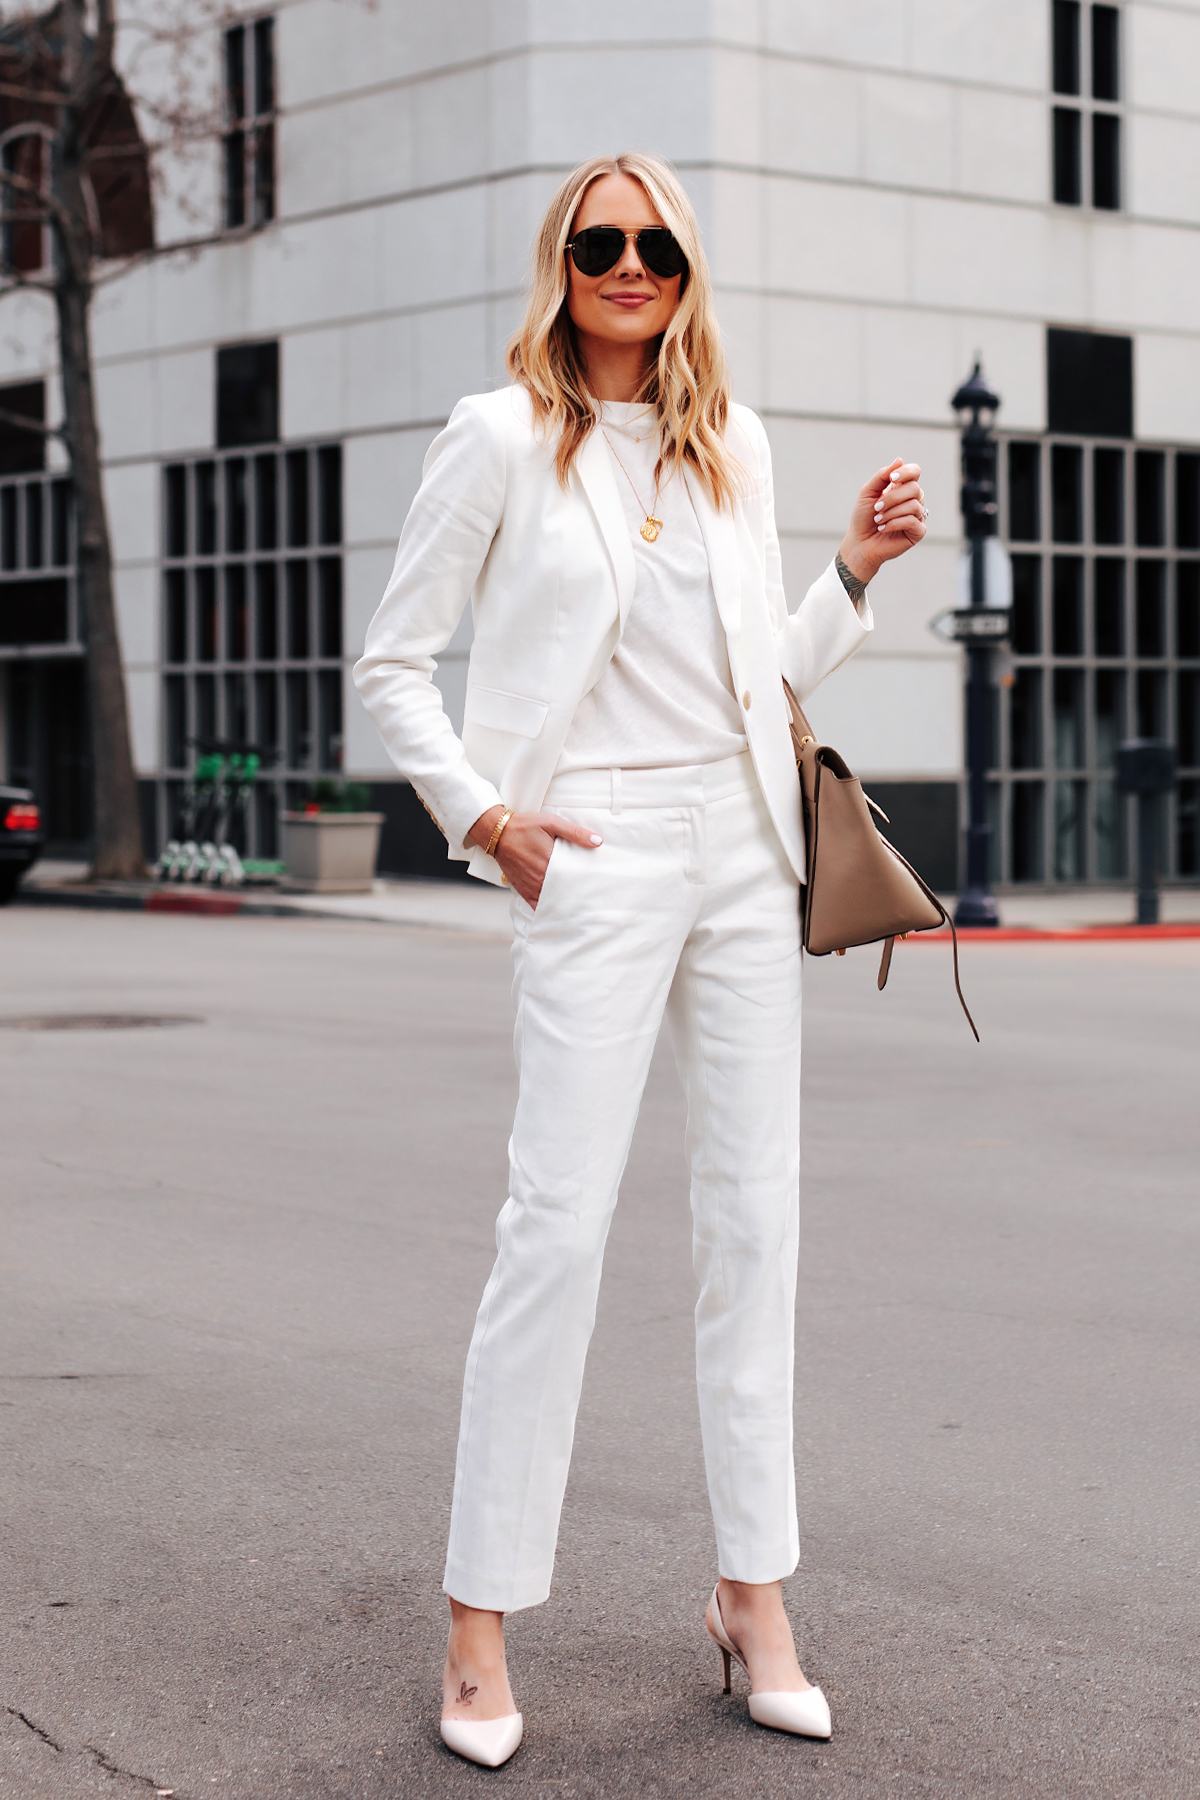 Fashion Jackson Ann Taylor White Blazer White Tshirt Ann Taylor White Pants White Pumps